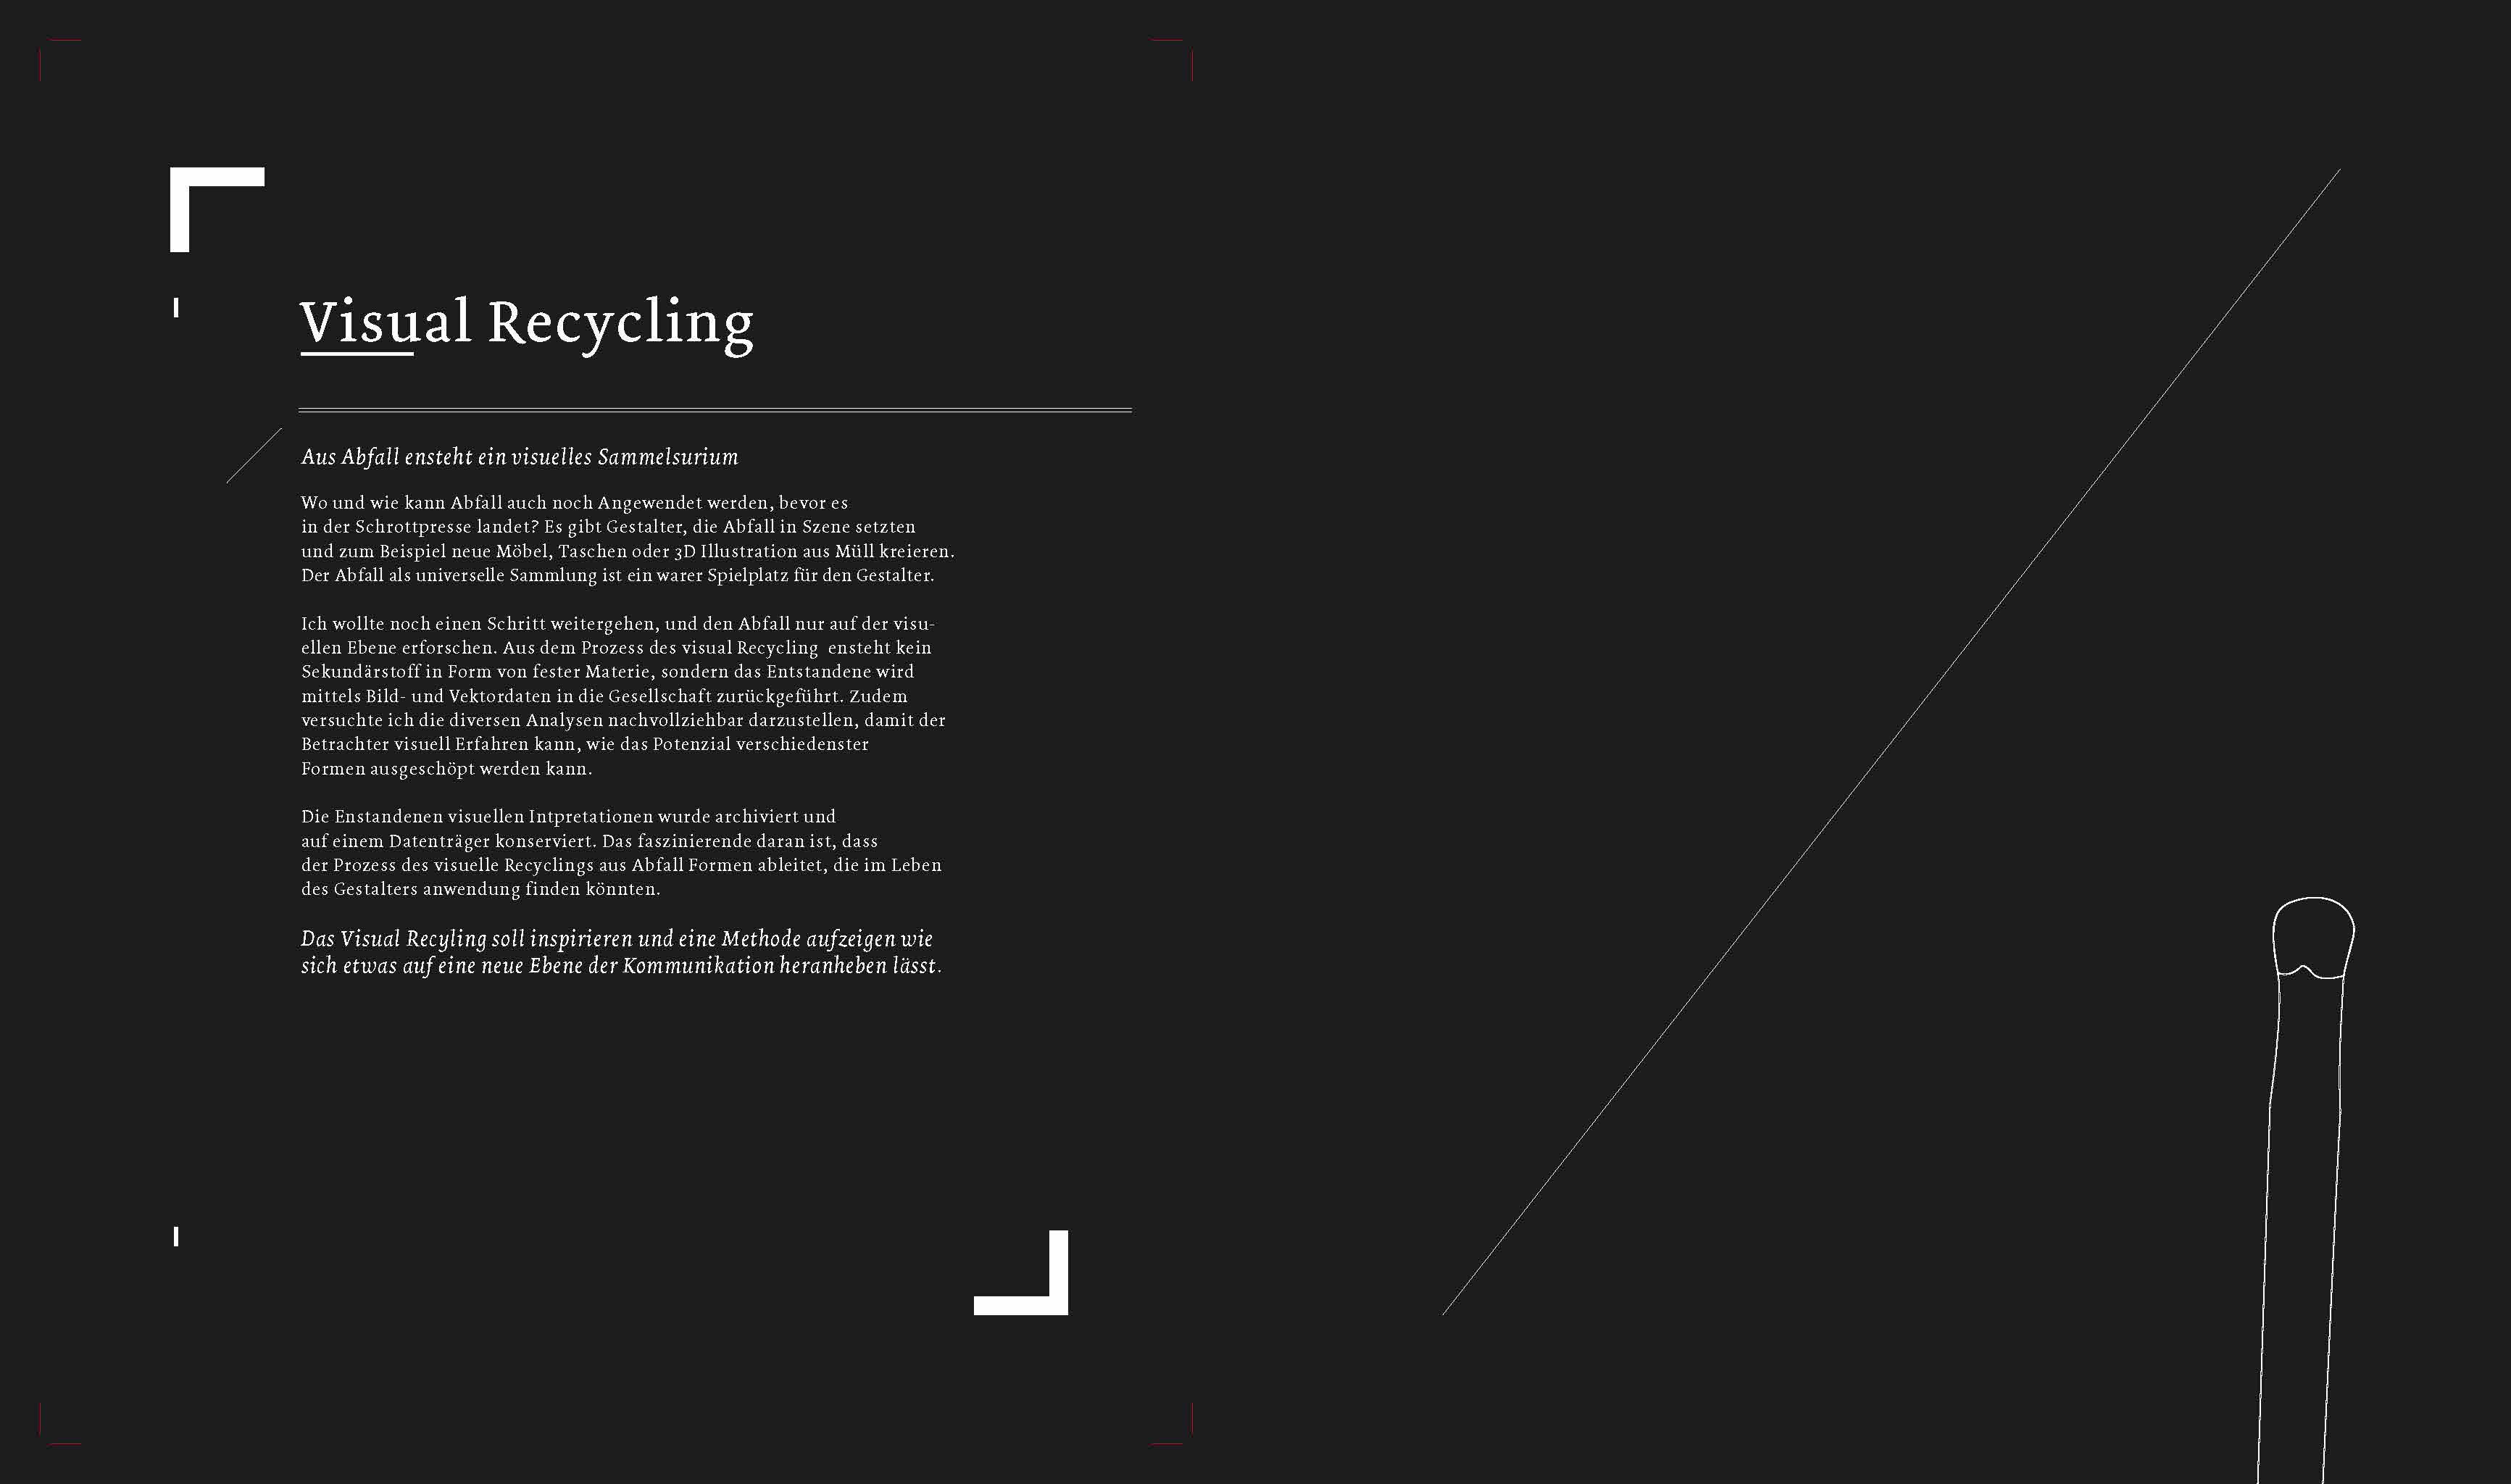 visual_recycling_druckboegen_Seite_005